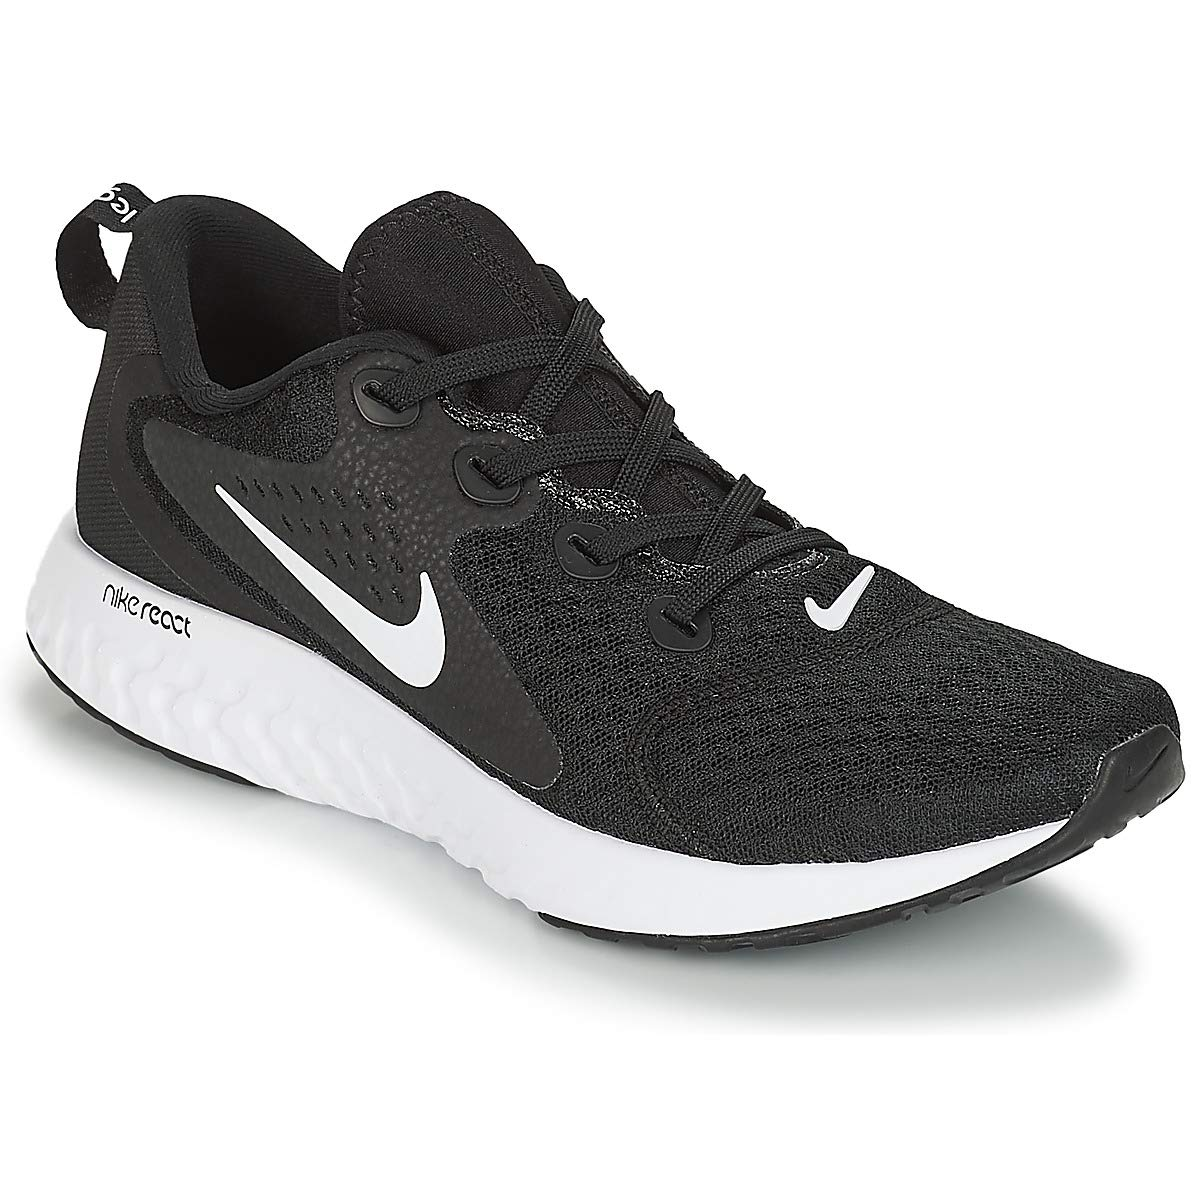 d393c779555d3 Nike Men s Legend React Running Shoes  Amazon.co.uk  Shoes   Bags